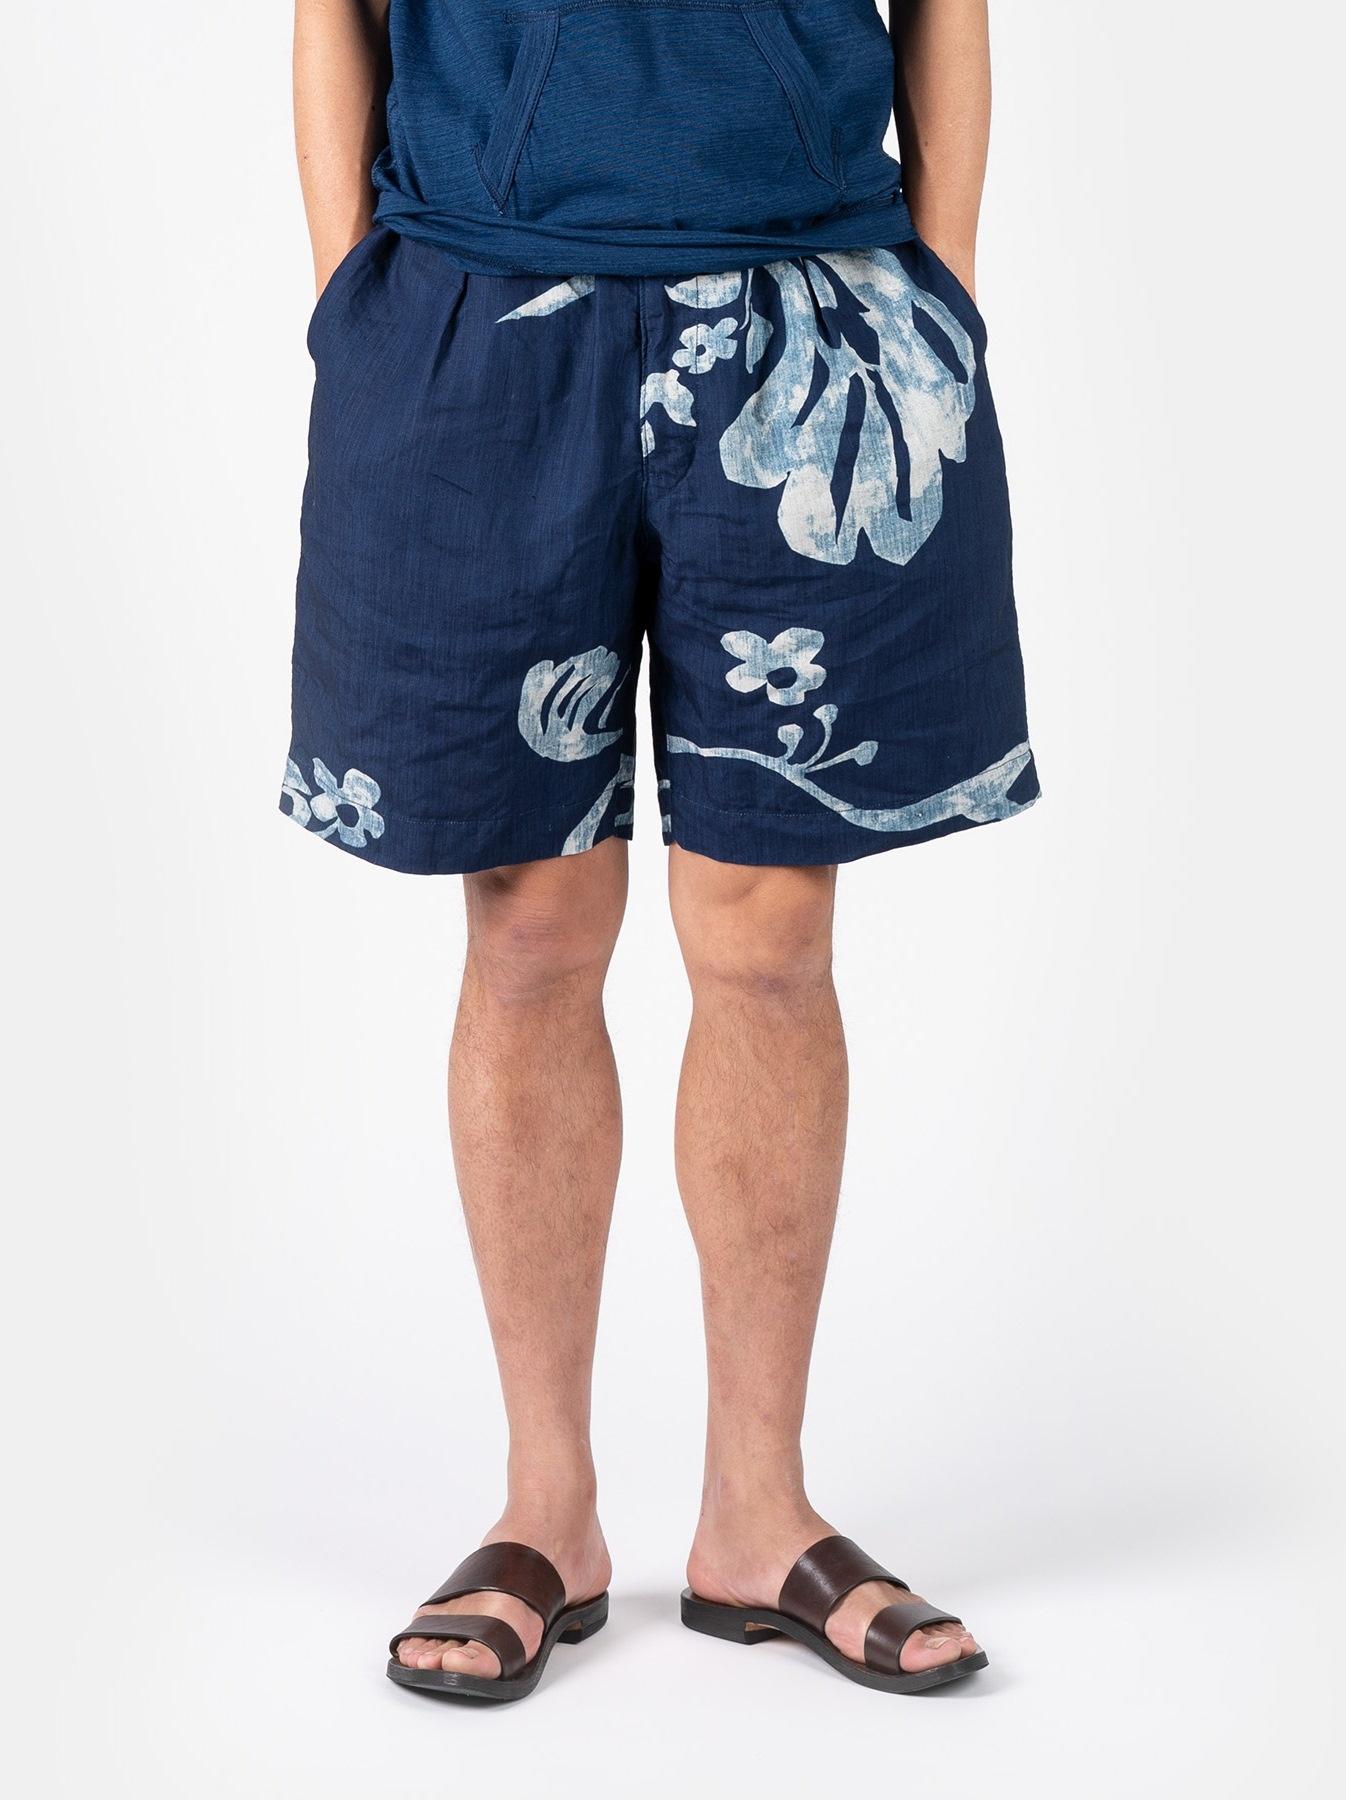 WH Indigo Linen Umiiloha 908 Short Pants-3